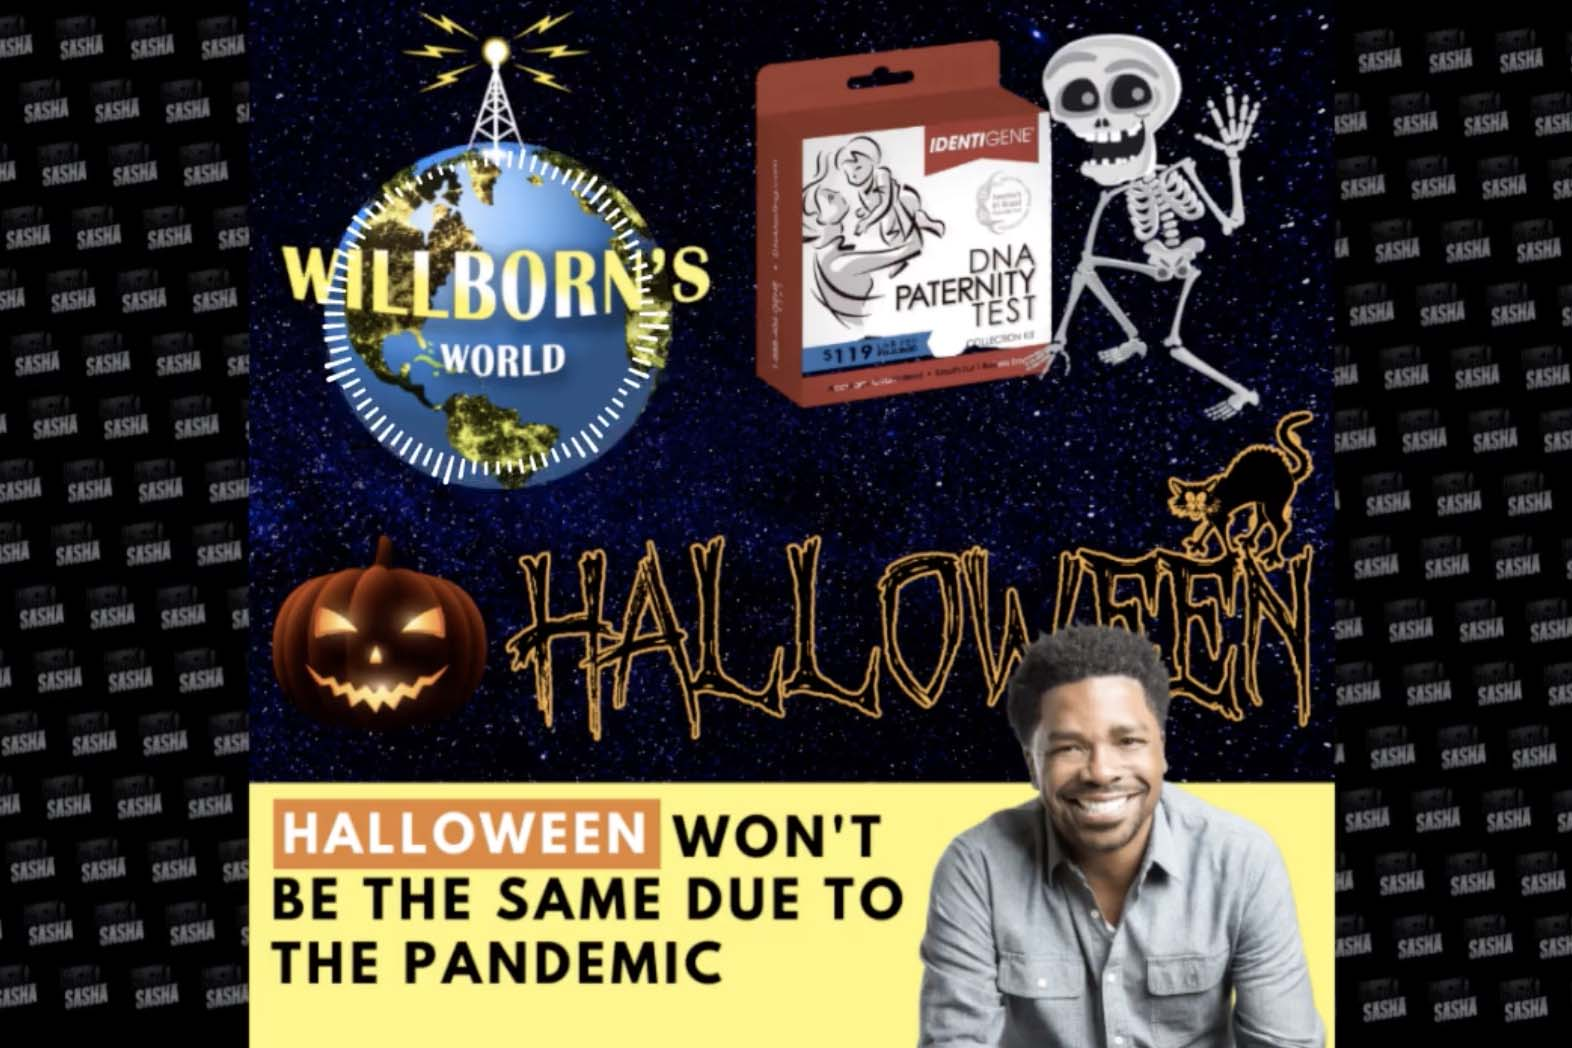 Willborn's World: Halloween Won't Be The Same This Year